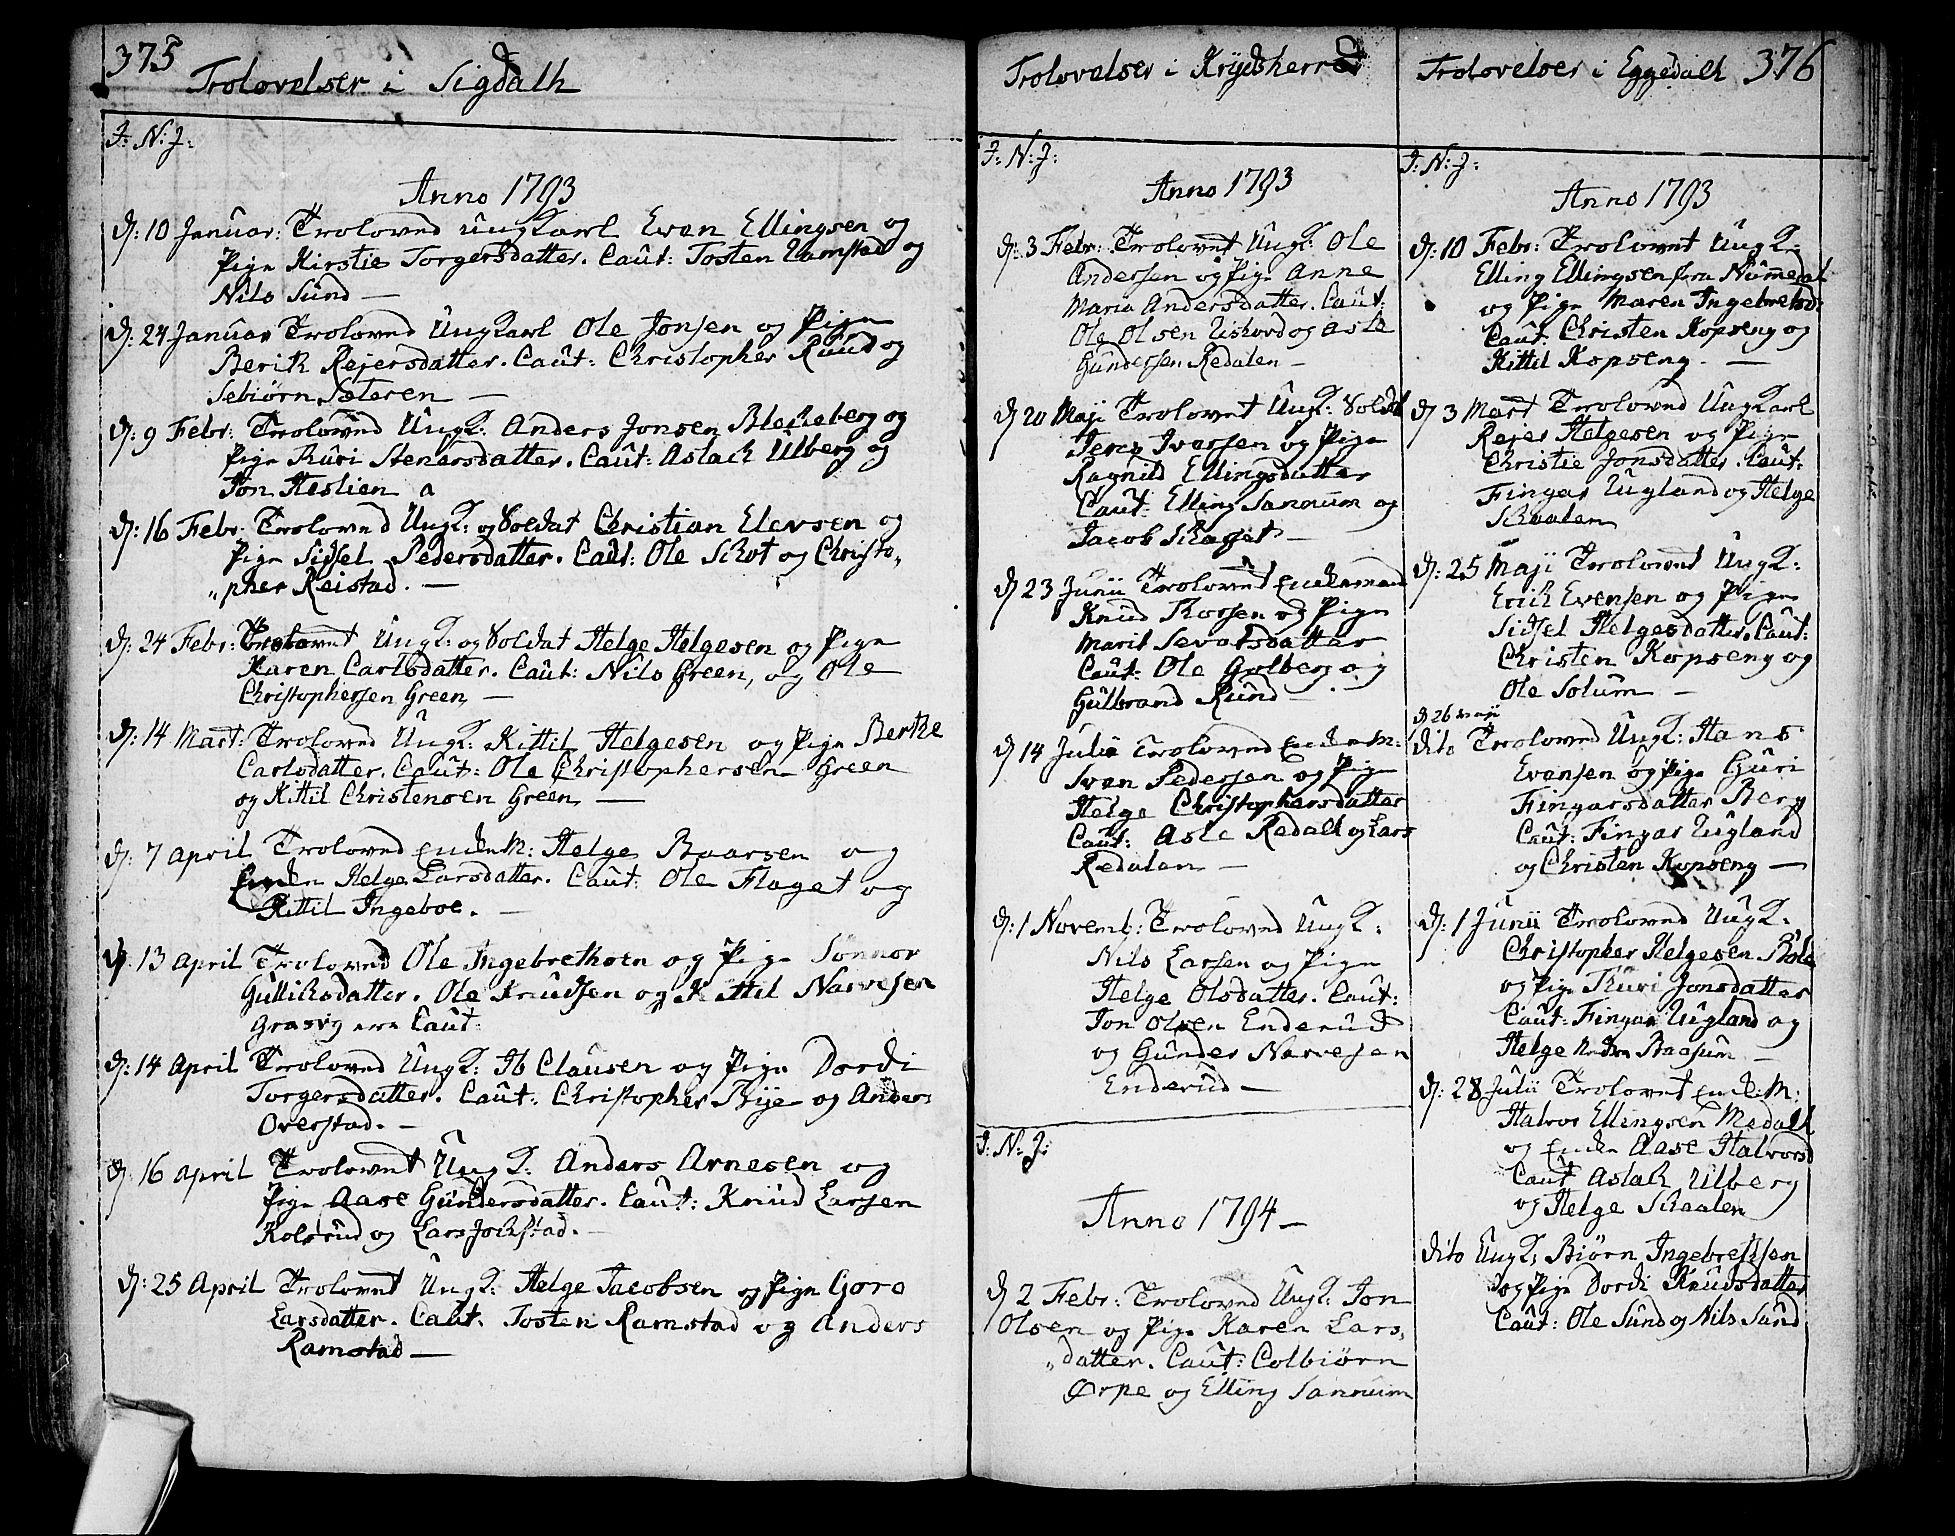 SAKO, Sigdal kirkebøker, F/Fa/L0003: Parish register (official) no. I 3, 1793-1811, p. 375-376